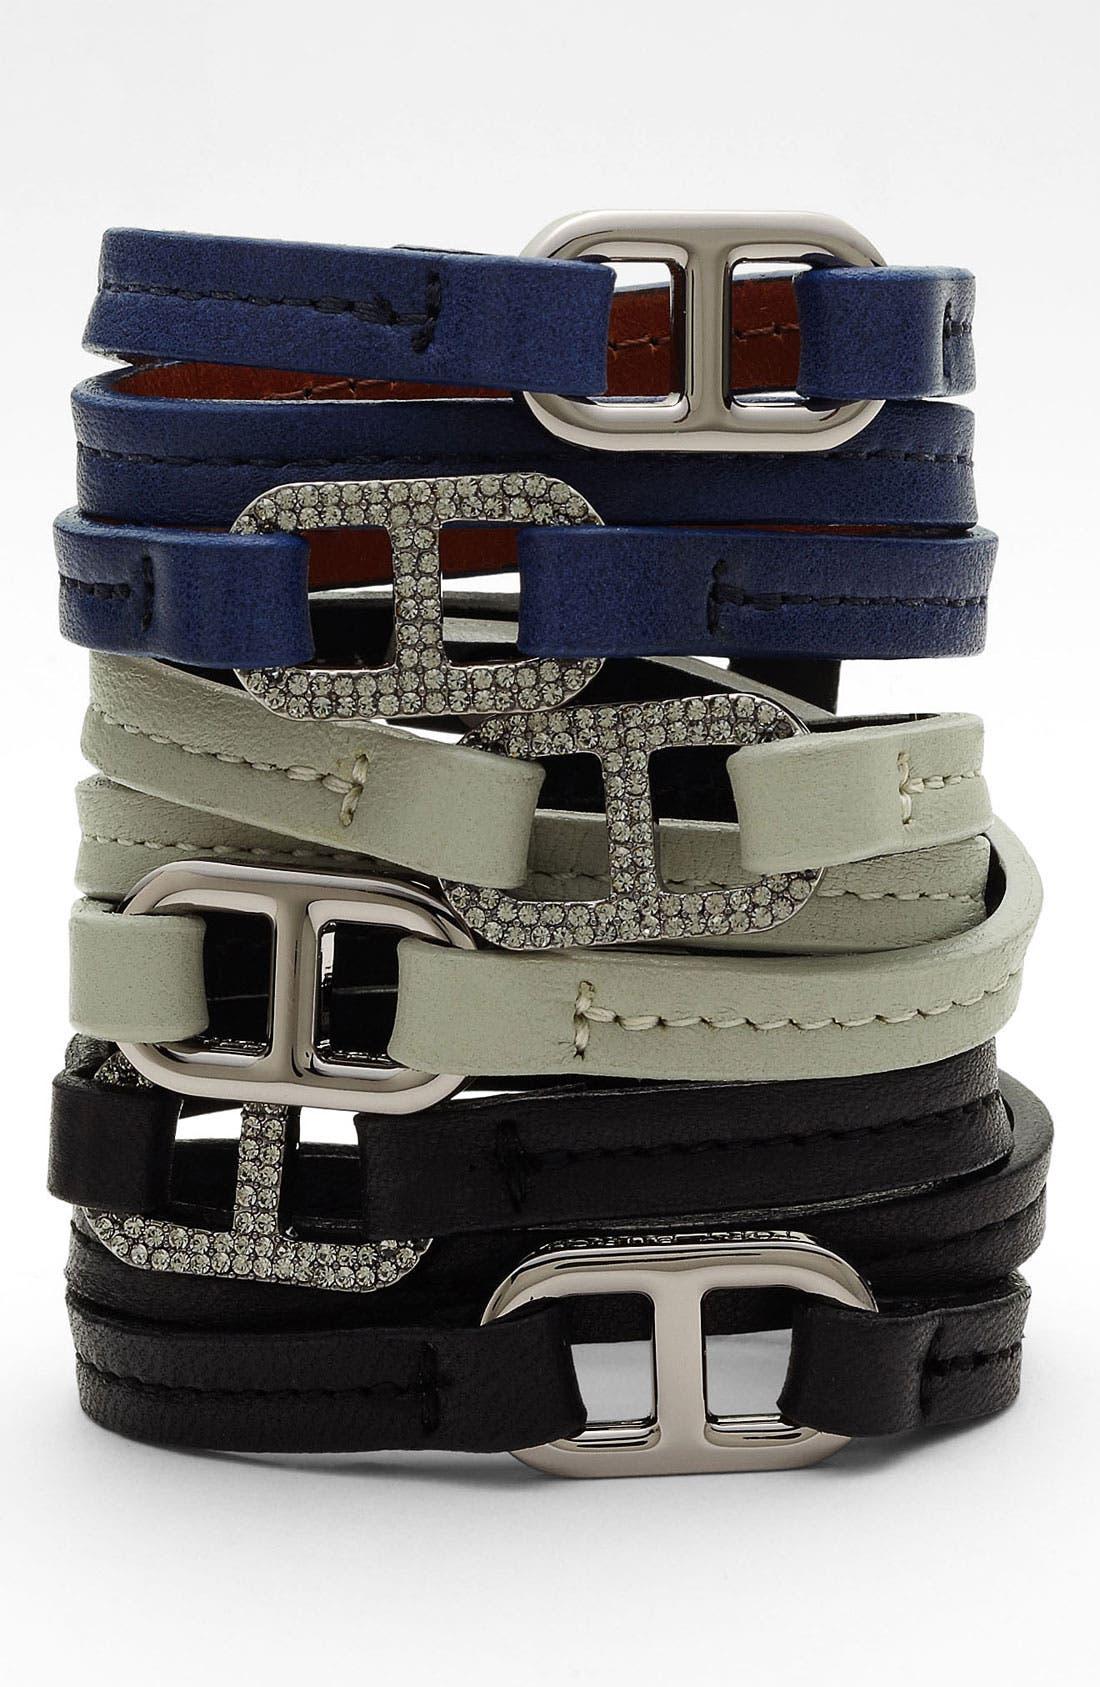 Alternate Image 1 Selected - Tory Burch 'Plato' Wrap Bracelet